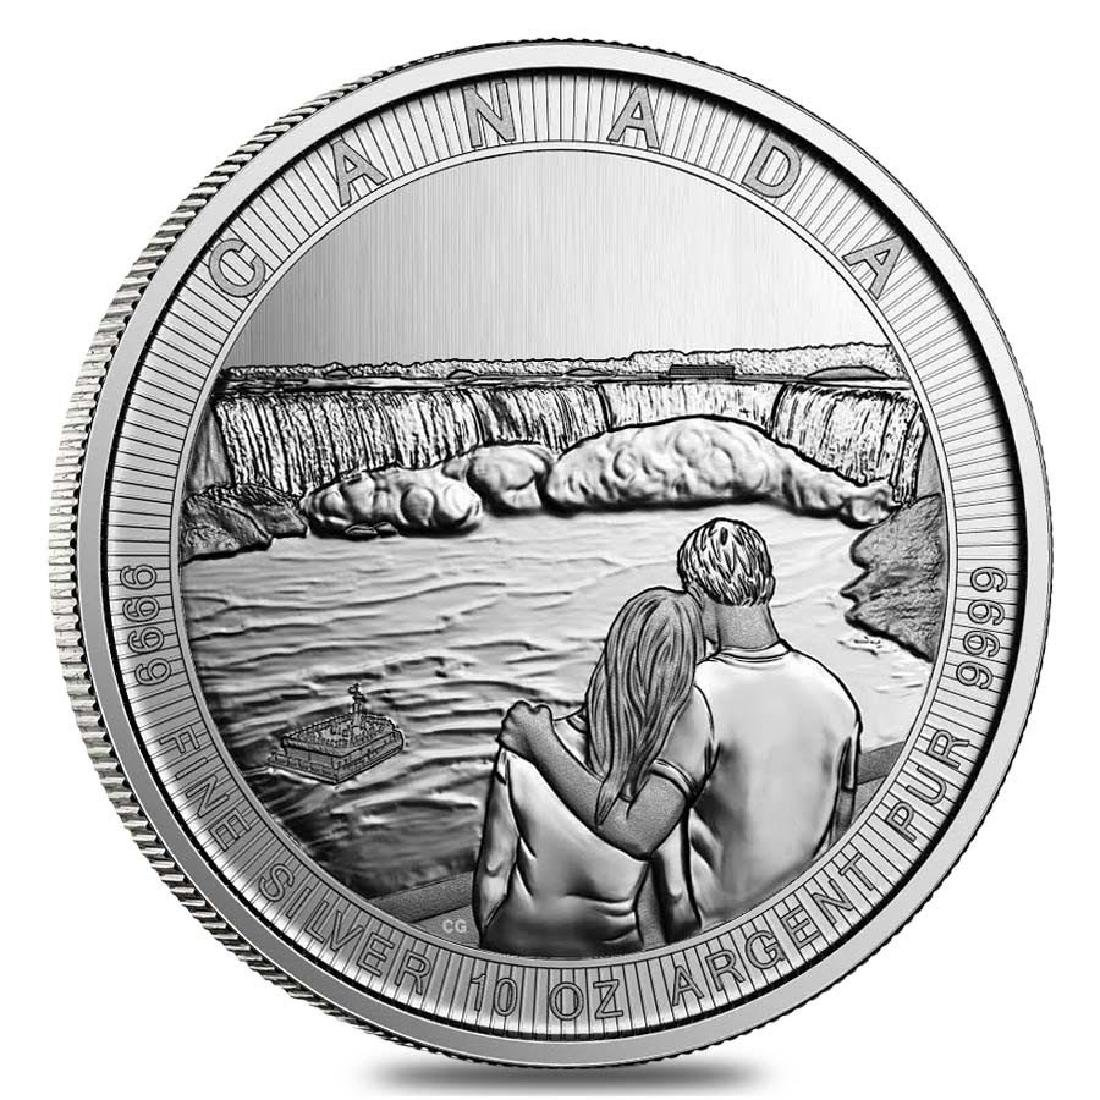 2017 10 oz Silver Canada the Great CTG Niagara Falls $5